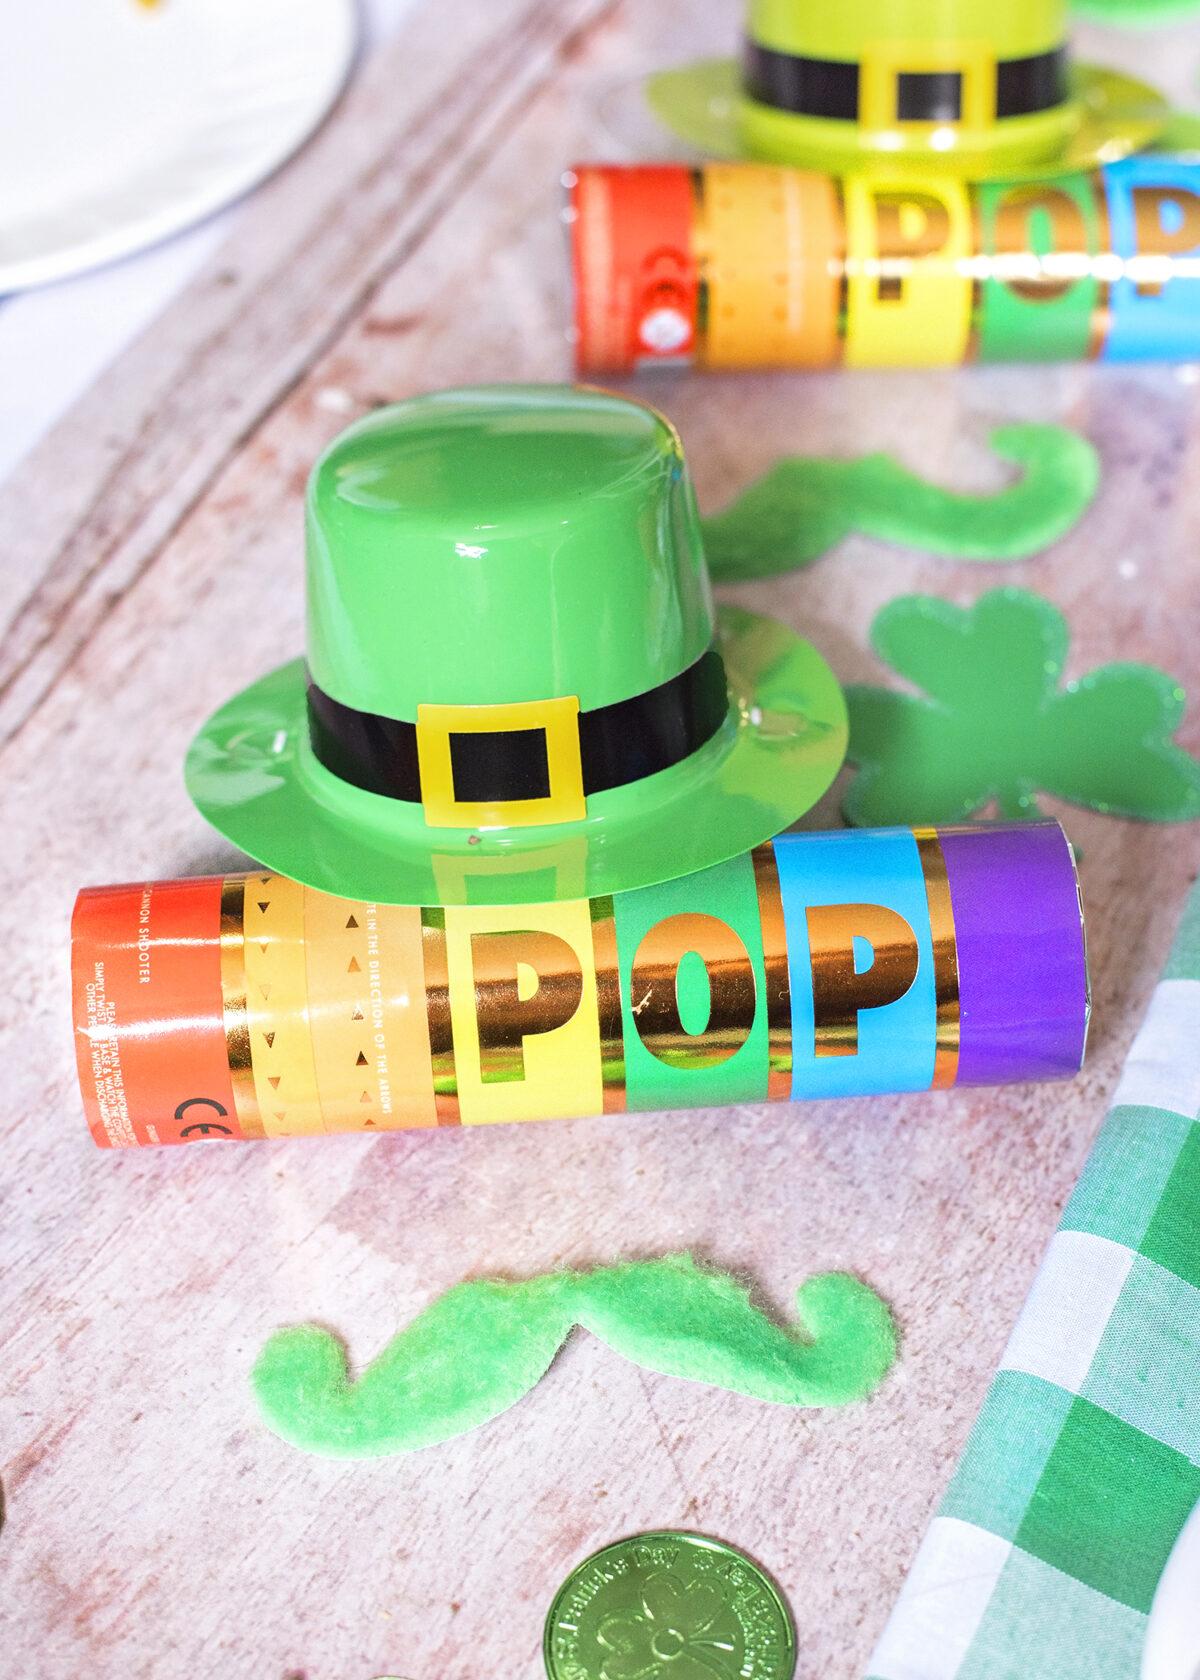 Leprechaun Party Favours. Mini Leprechaun hat, Green Stick on moustache and rainbow confetti party popper cannon.